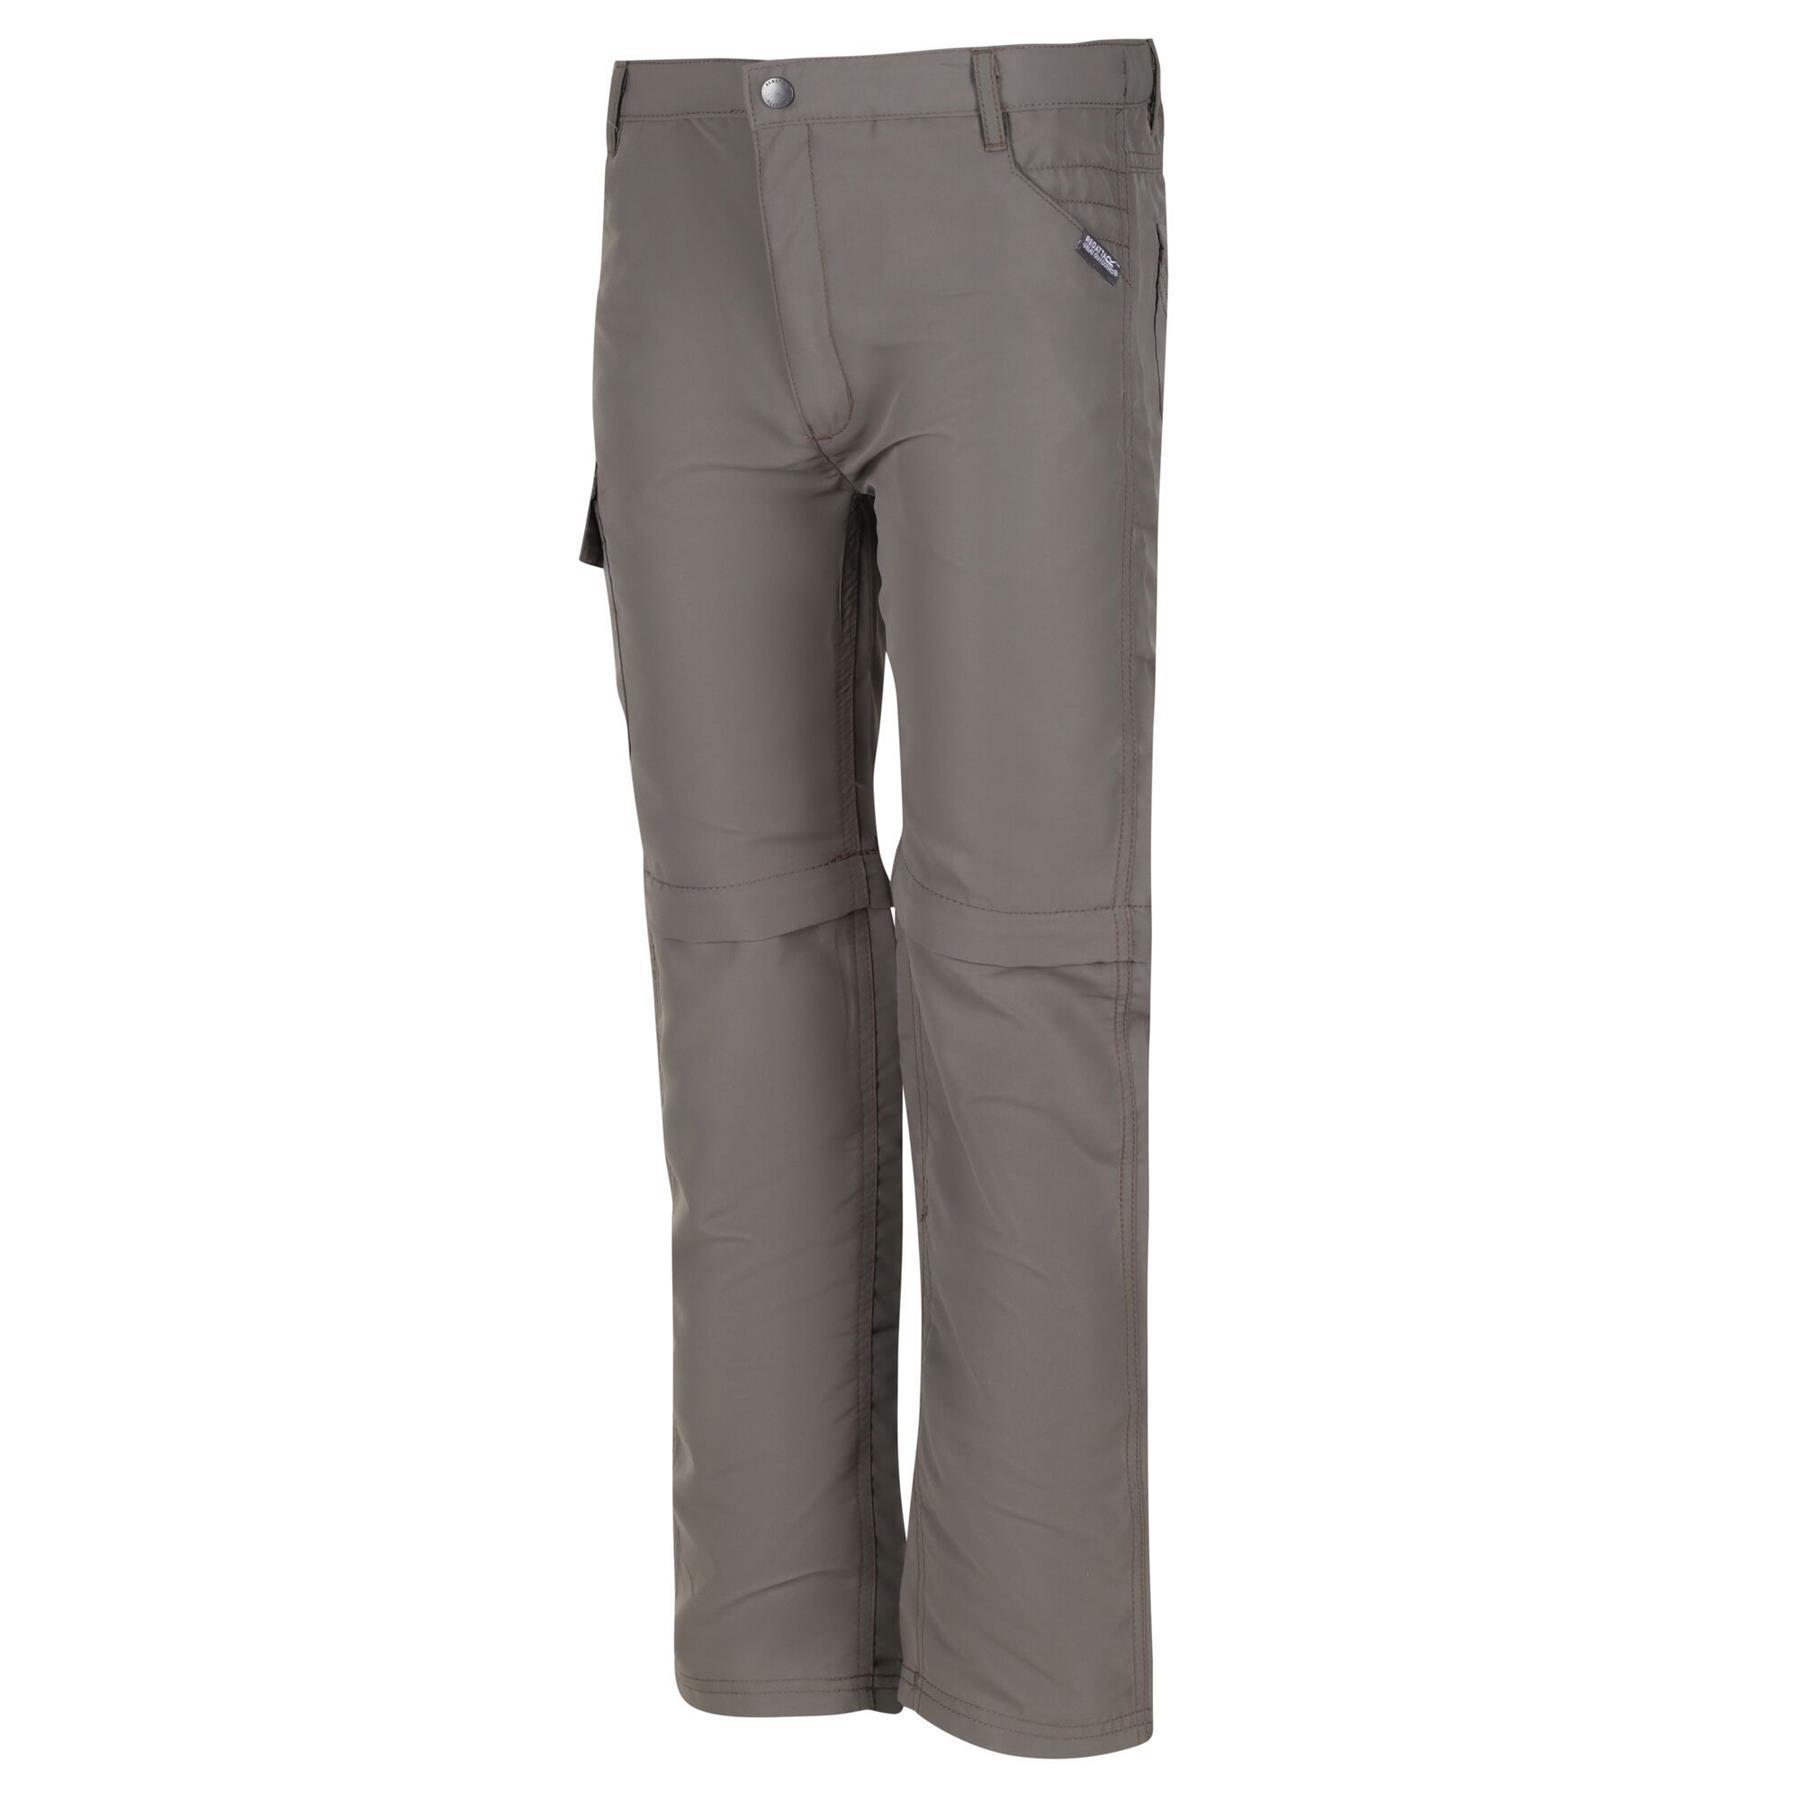 miniatuur 9 - Regatta Kids Sorcer II Zip Off Convertible Trousers Boys Girls